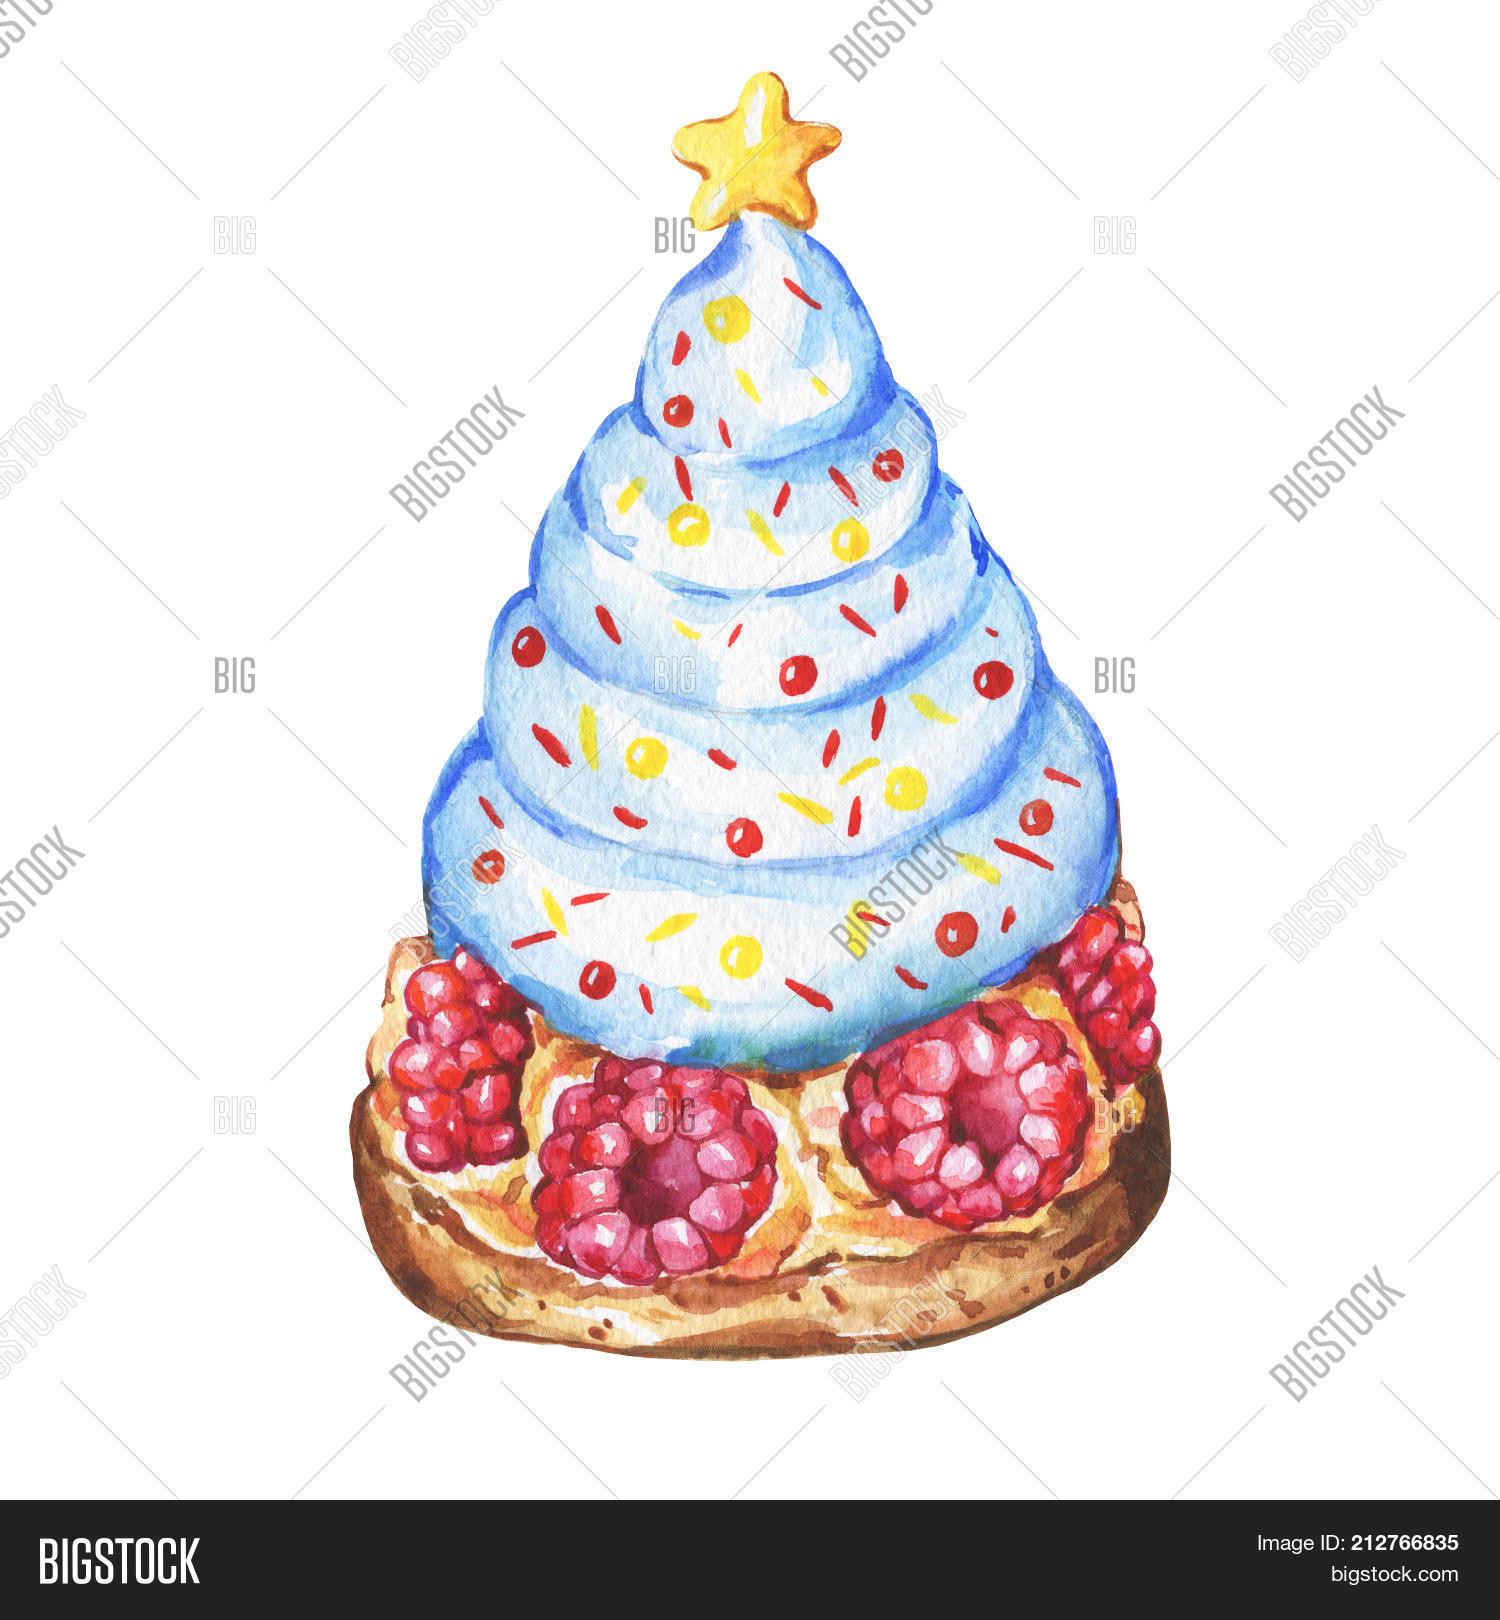 Blue Cupcake Christmas Image Photo Free Trial Bigstock